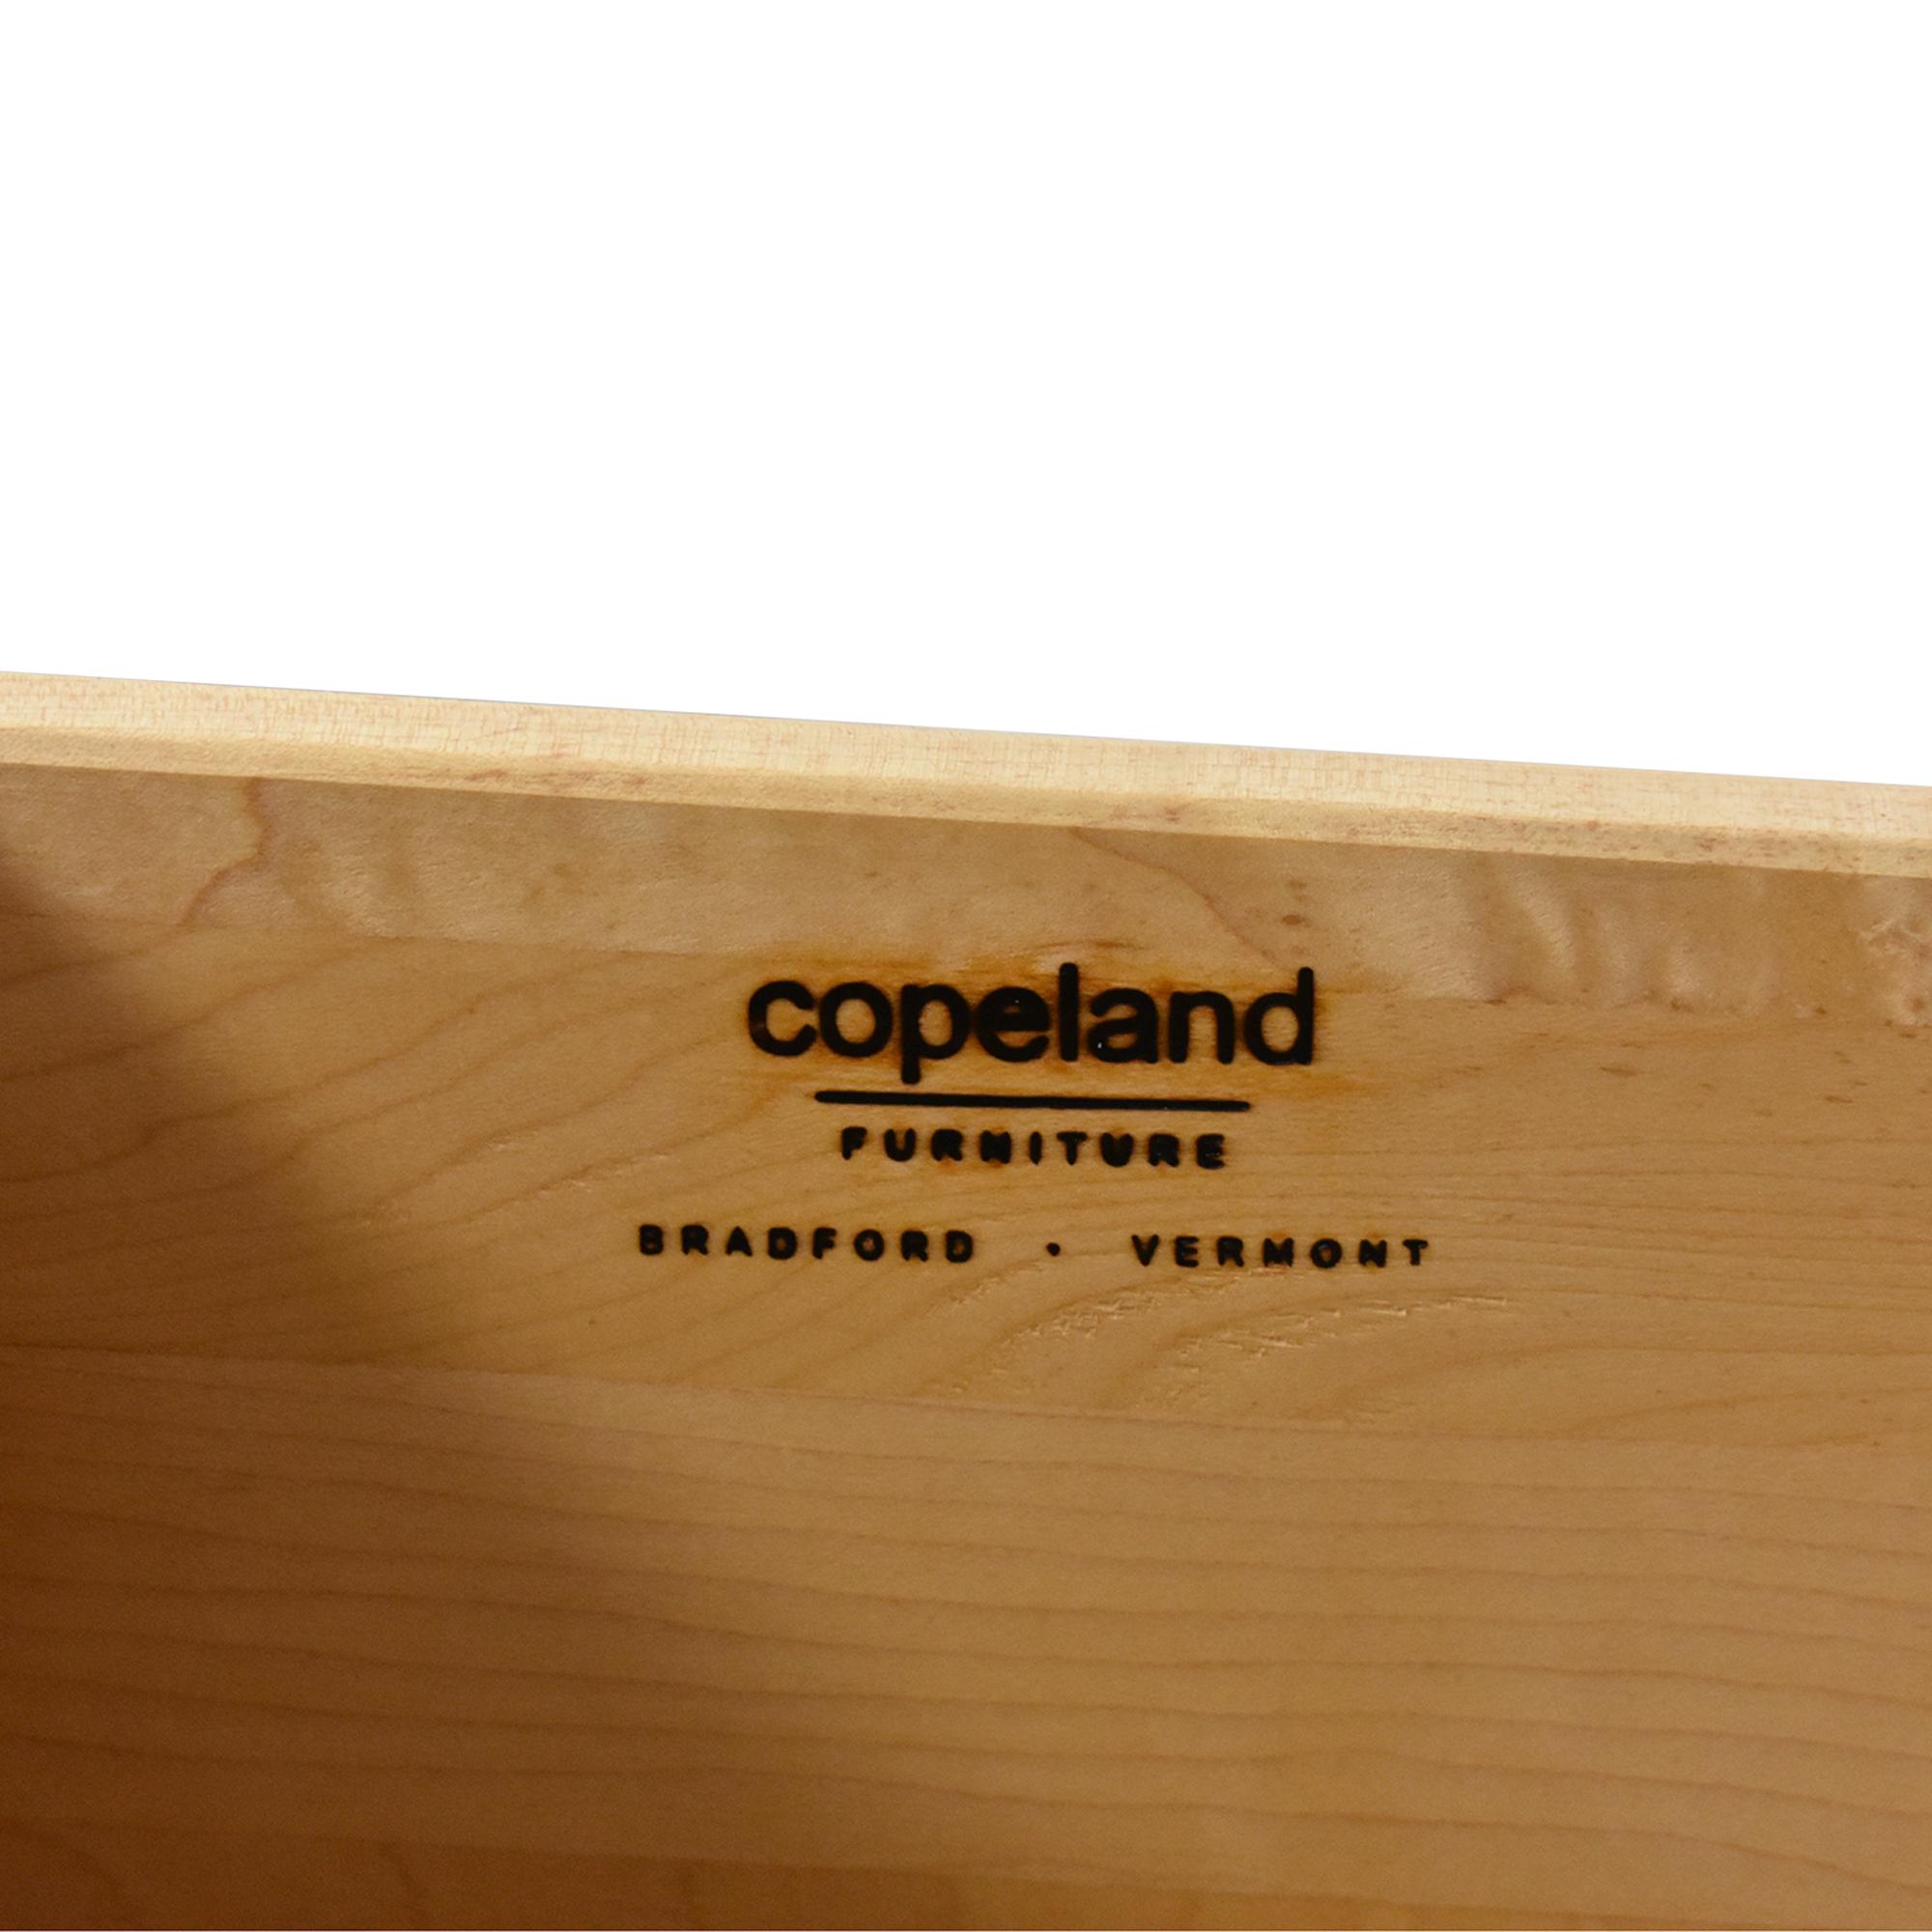 Crate & Barrel Crate & Barrel Cabot by Copeland Tall Dresser brown